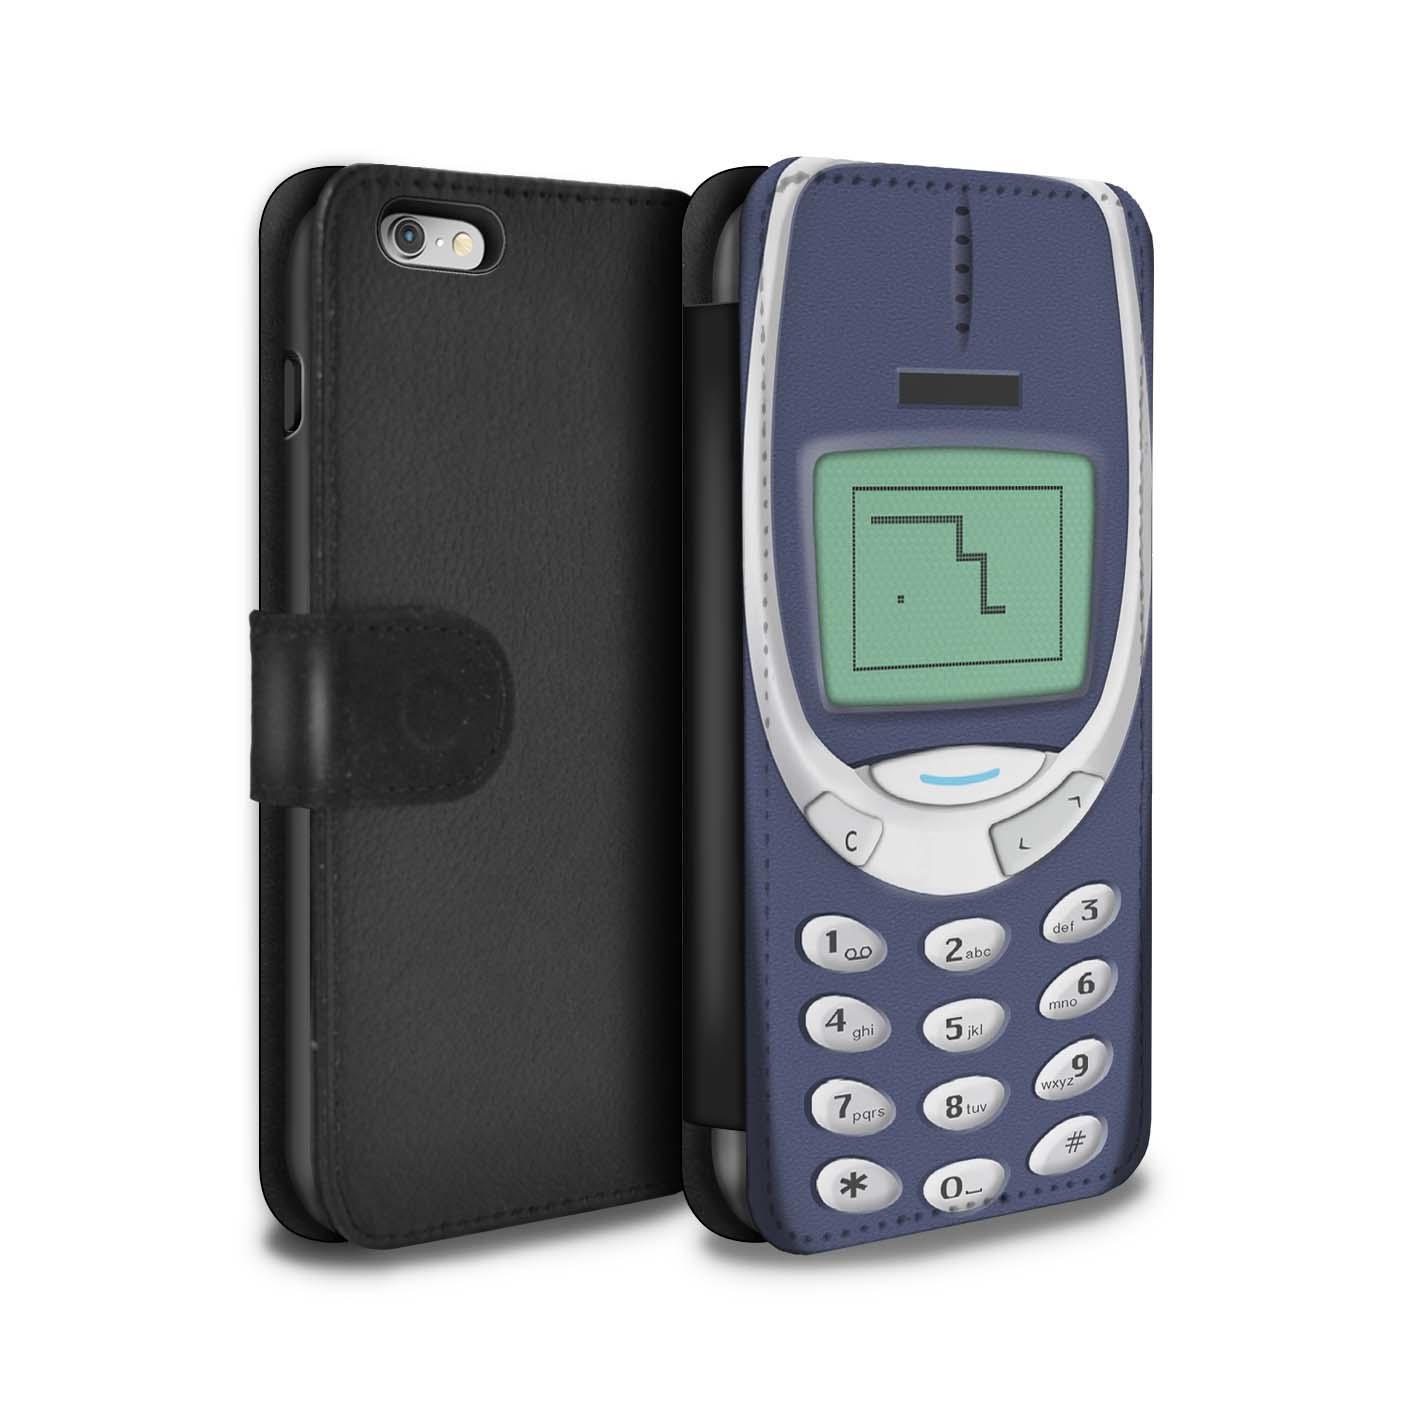 STUFF4-Coque-Etui-Case-Cuir-PU-pour-Apple-iPhone-6-Plus-5-5-Portables-retro